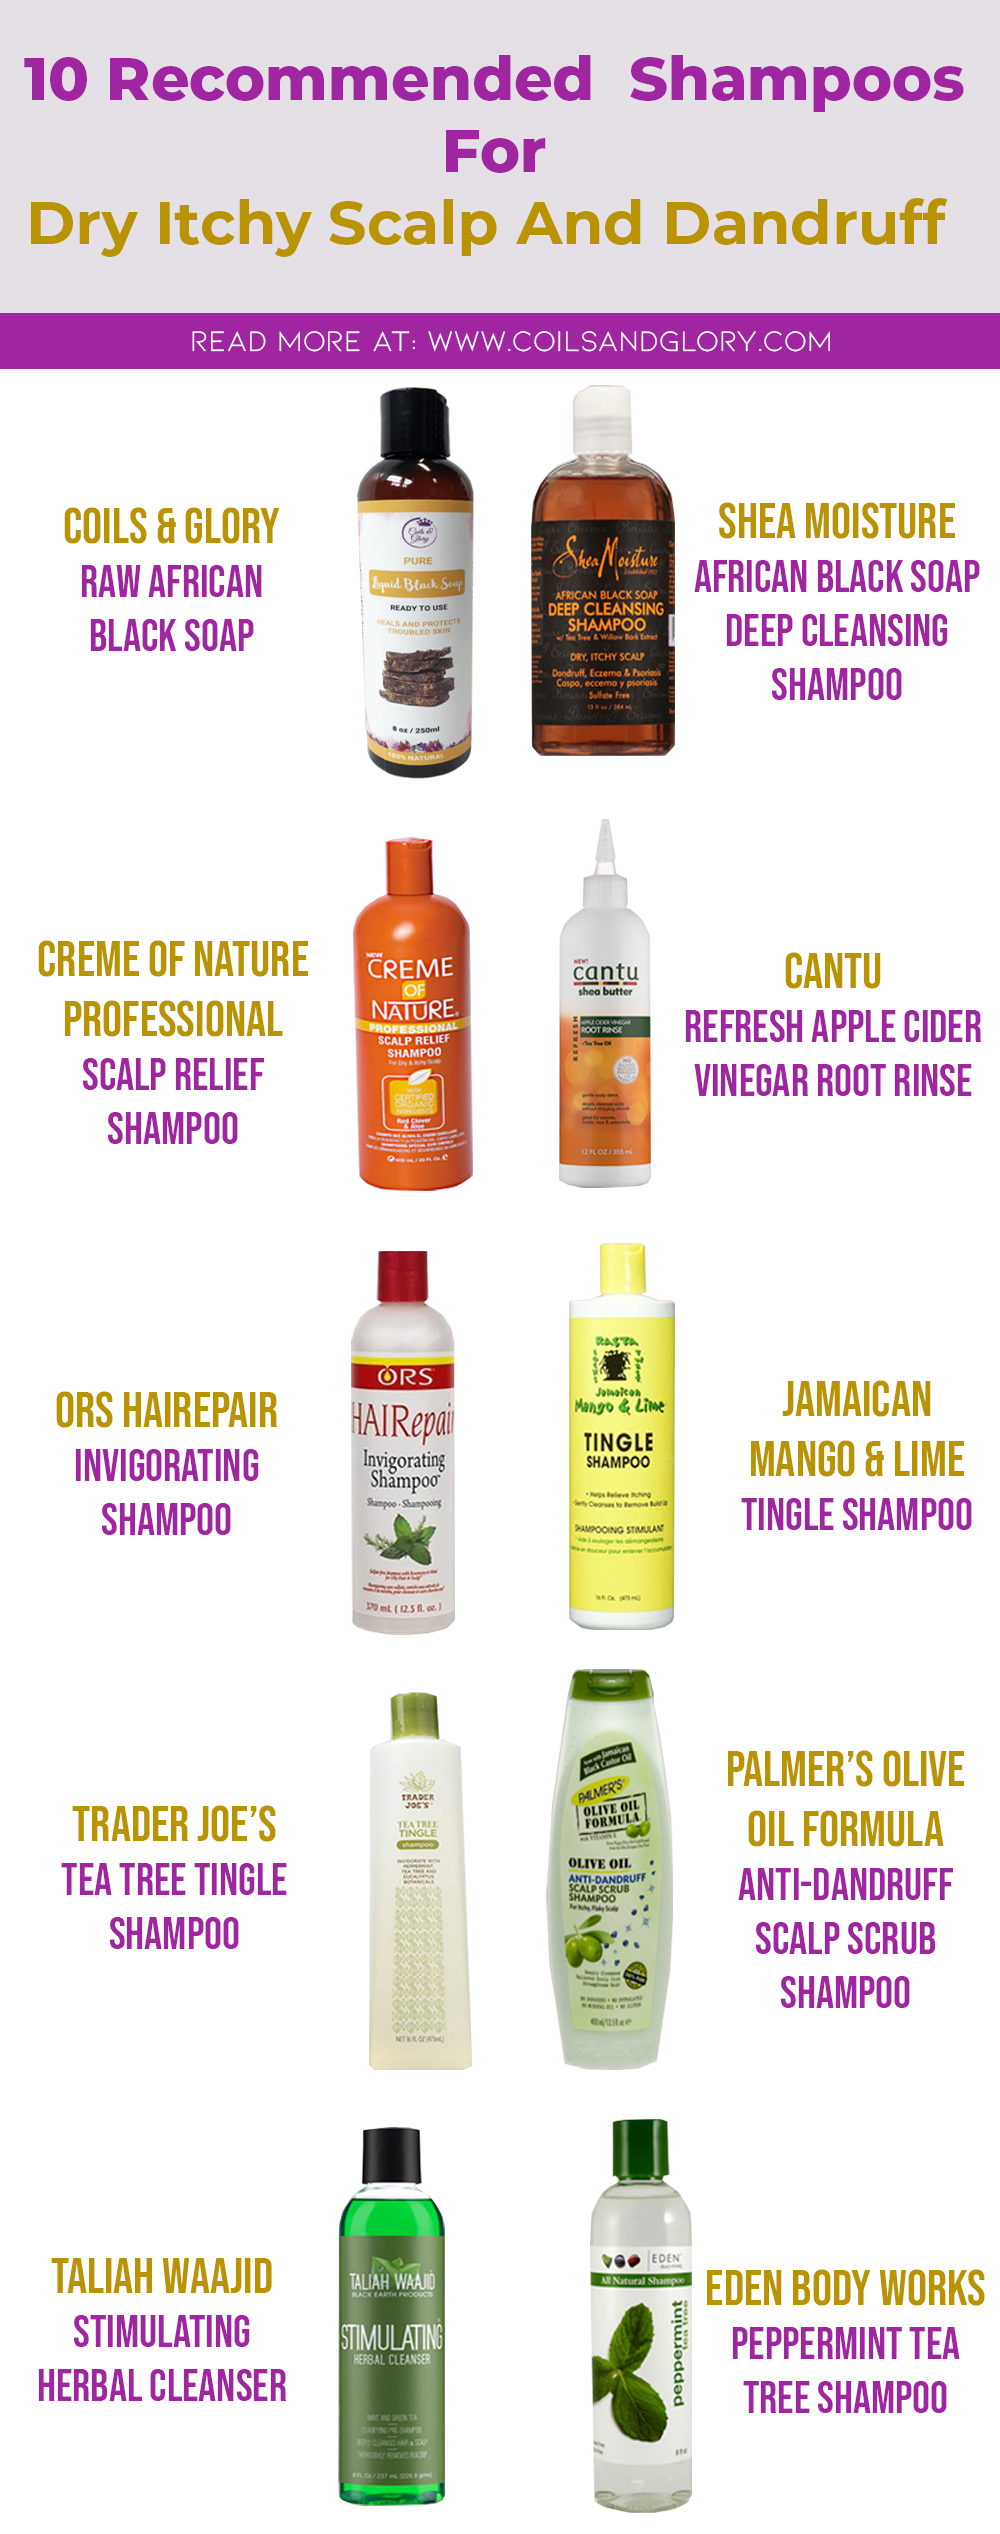 20 Healing Benefits of Liquid African Black Soap You Need